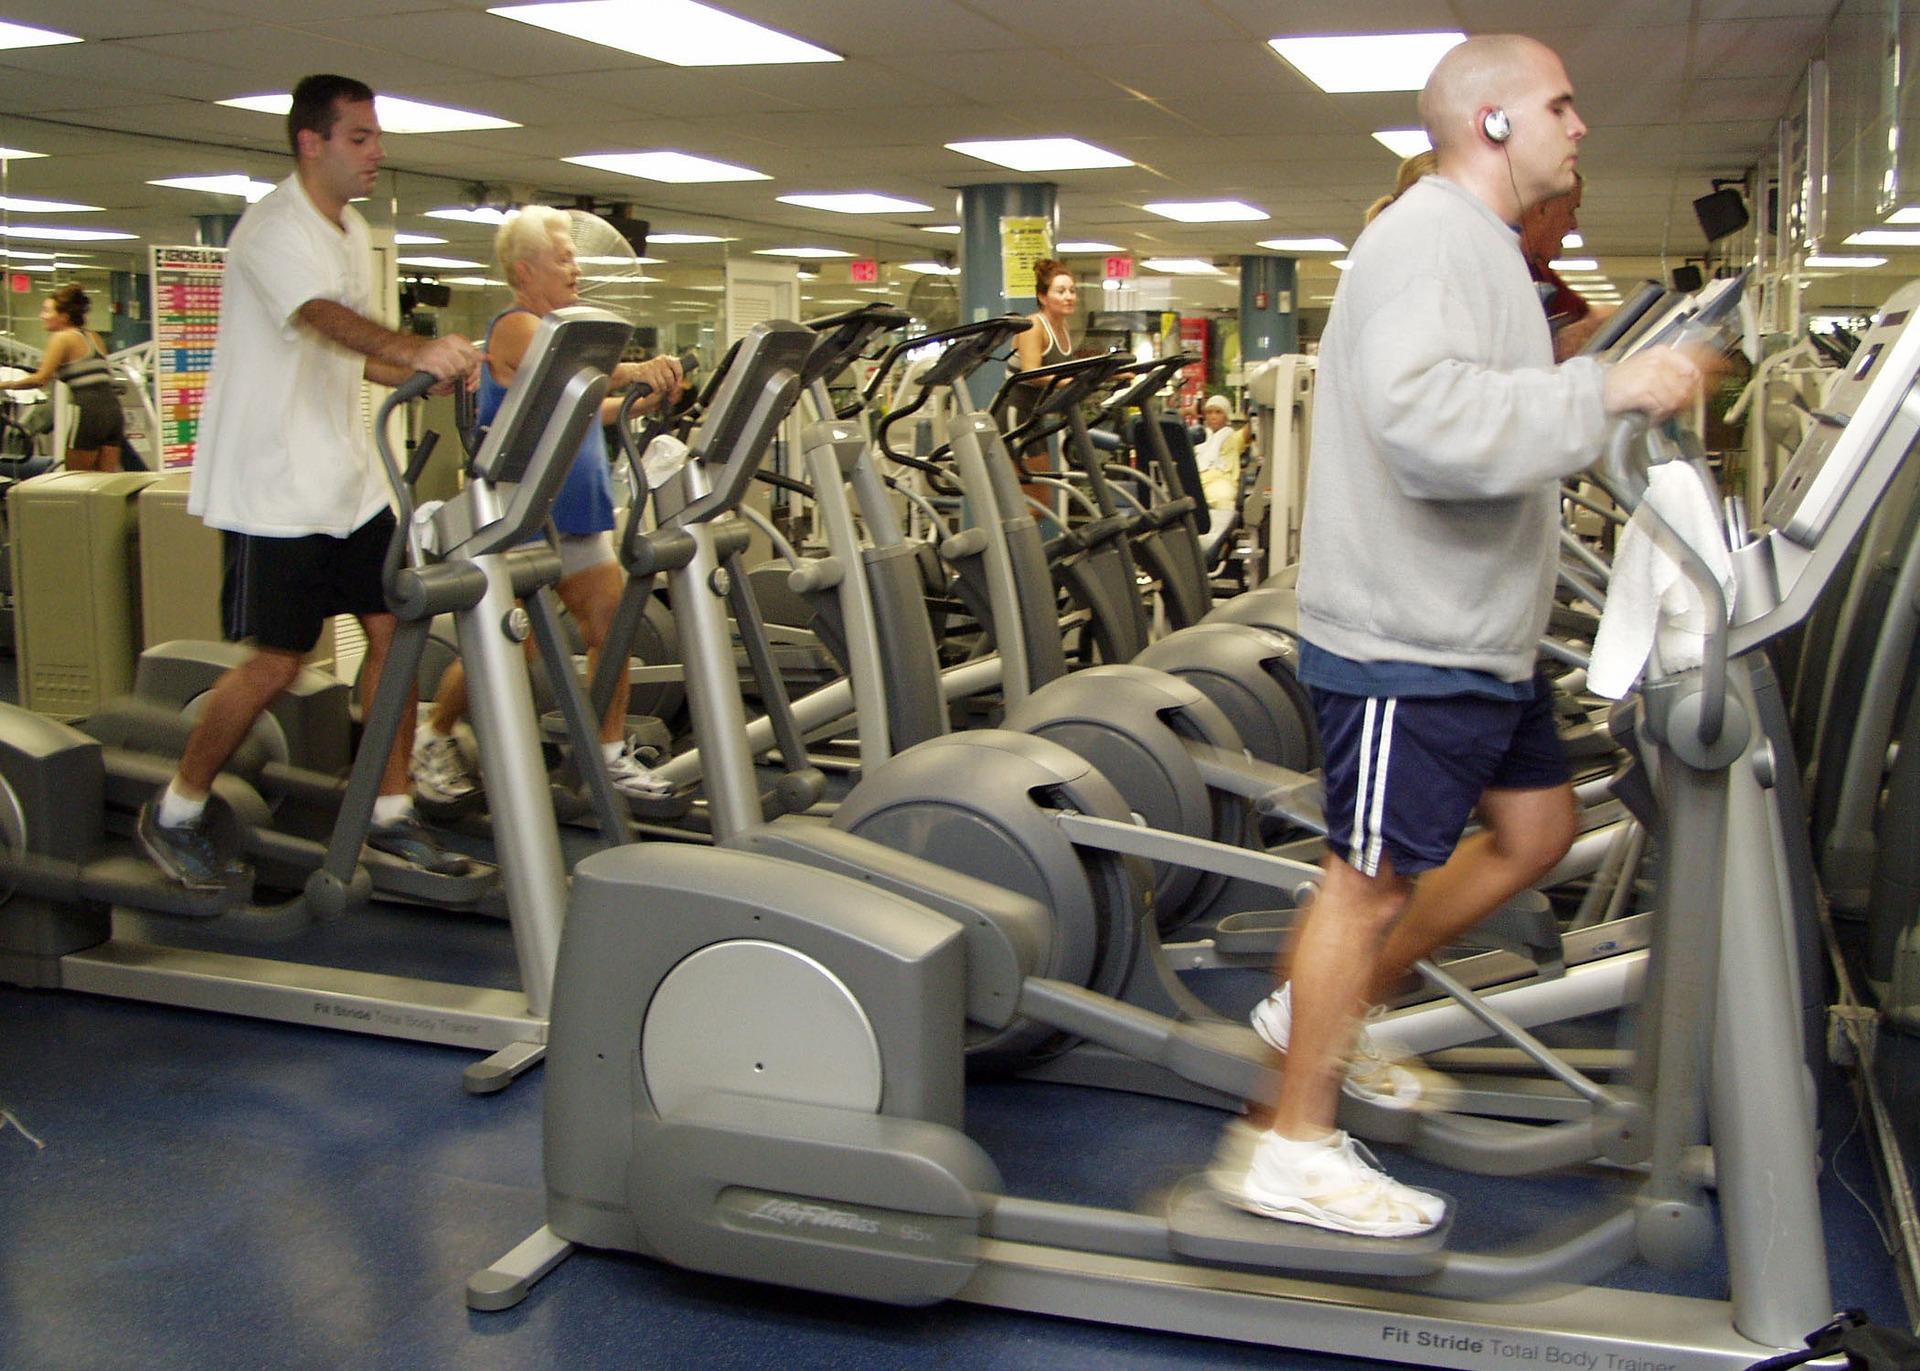 gym-room-1180016_1920